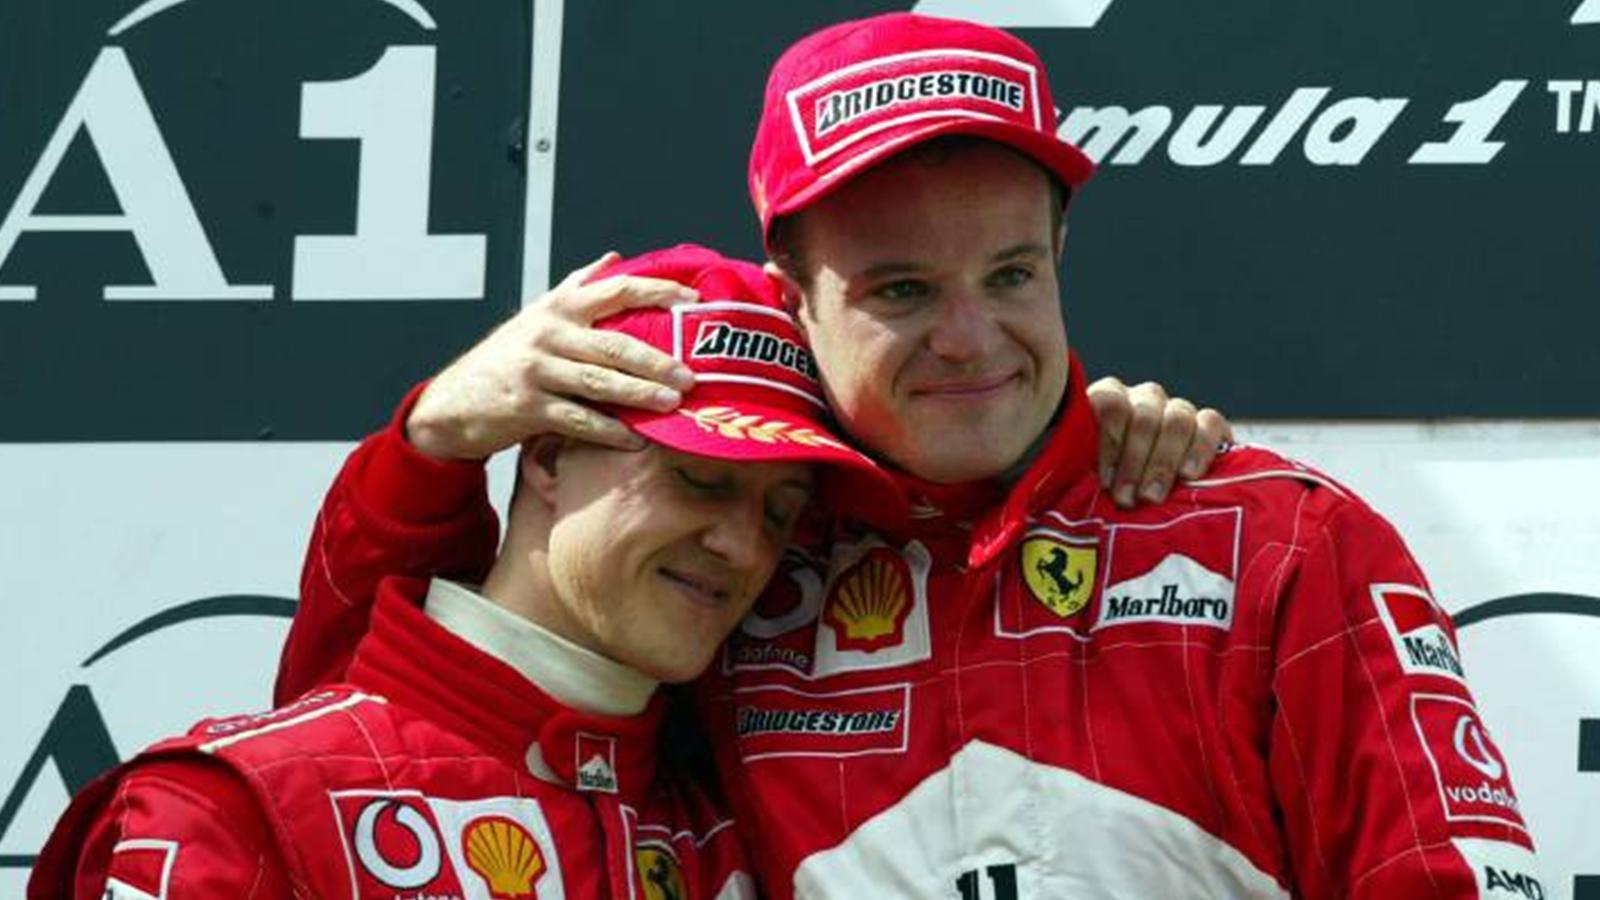 michael schumacher rubens barrichello austrian gp f1 2002 podium